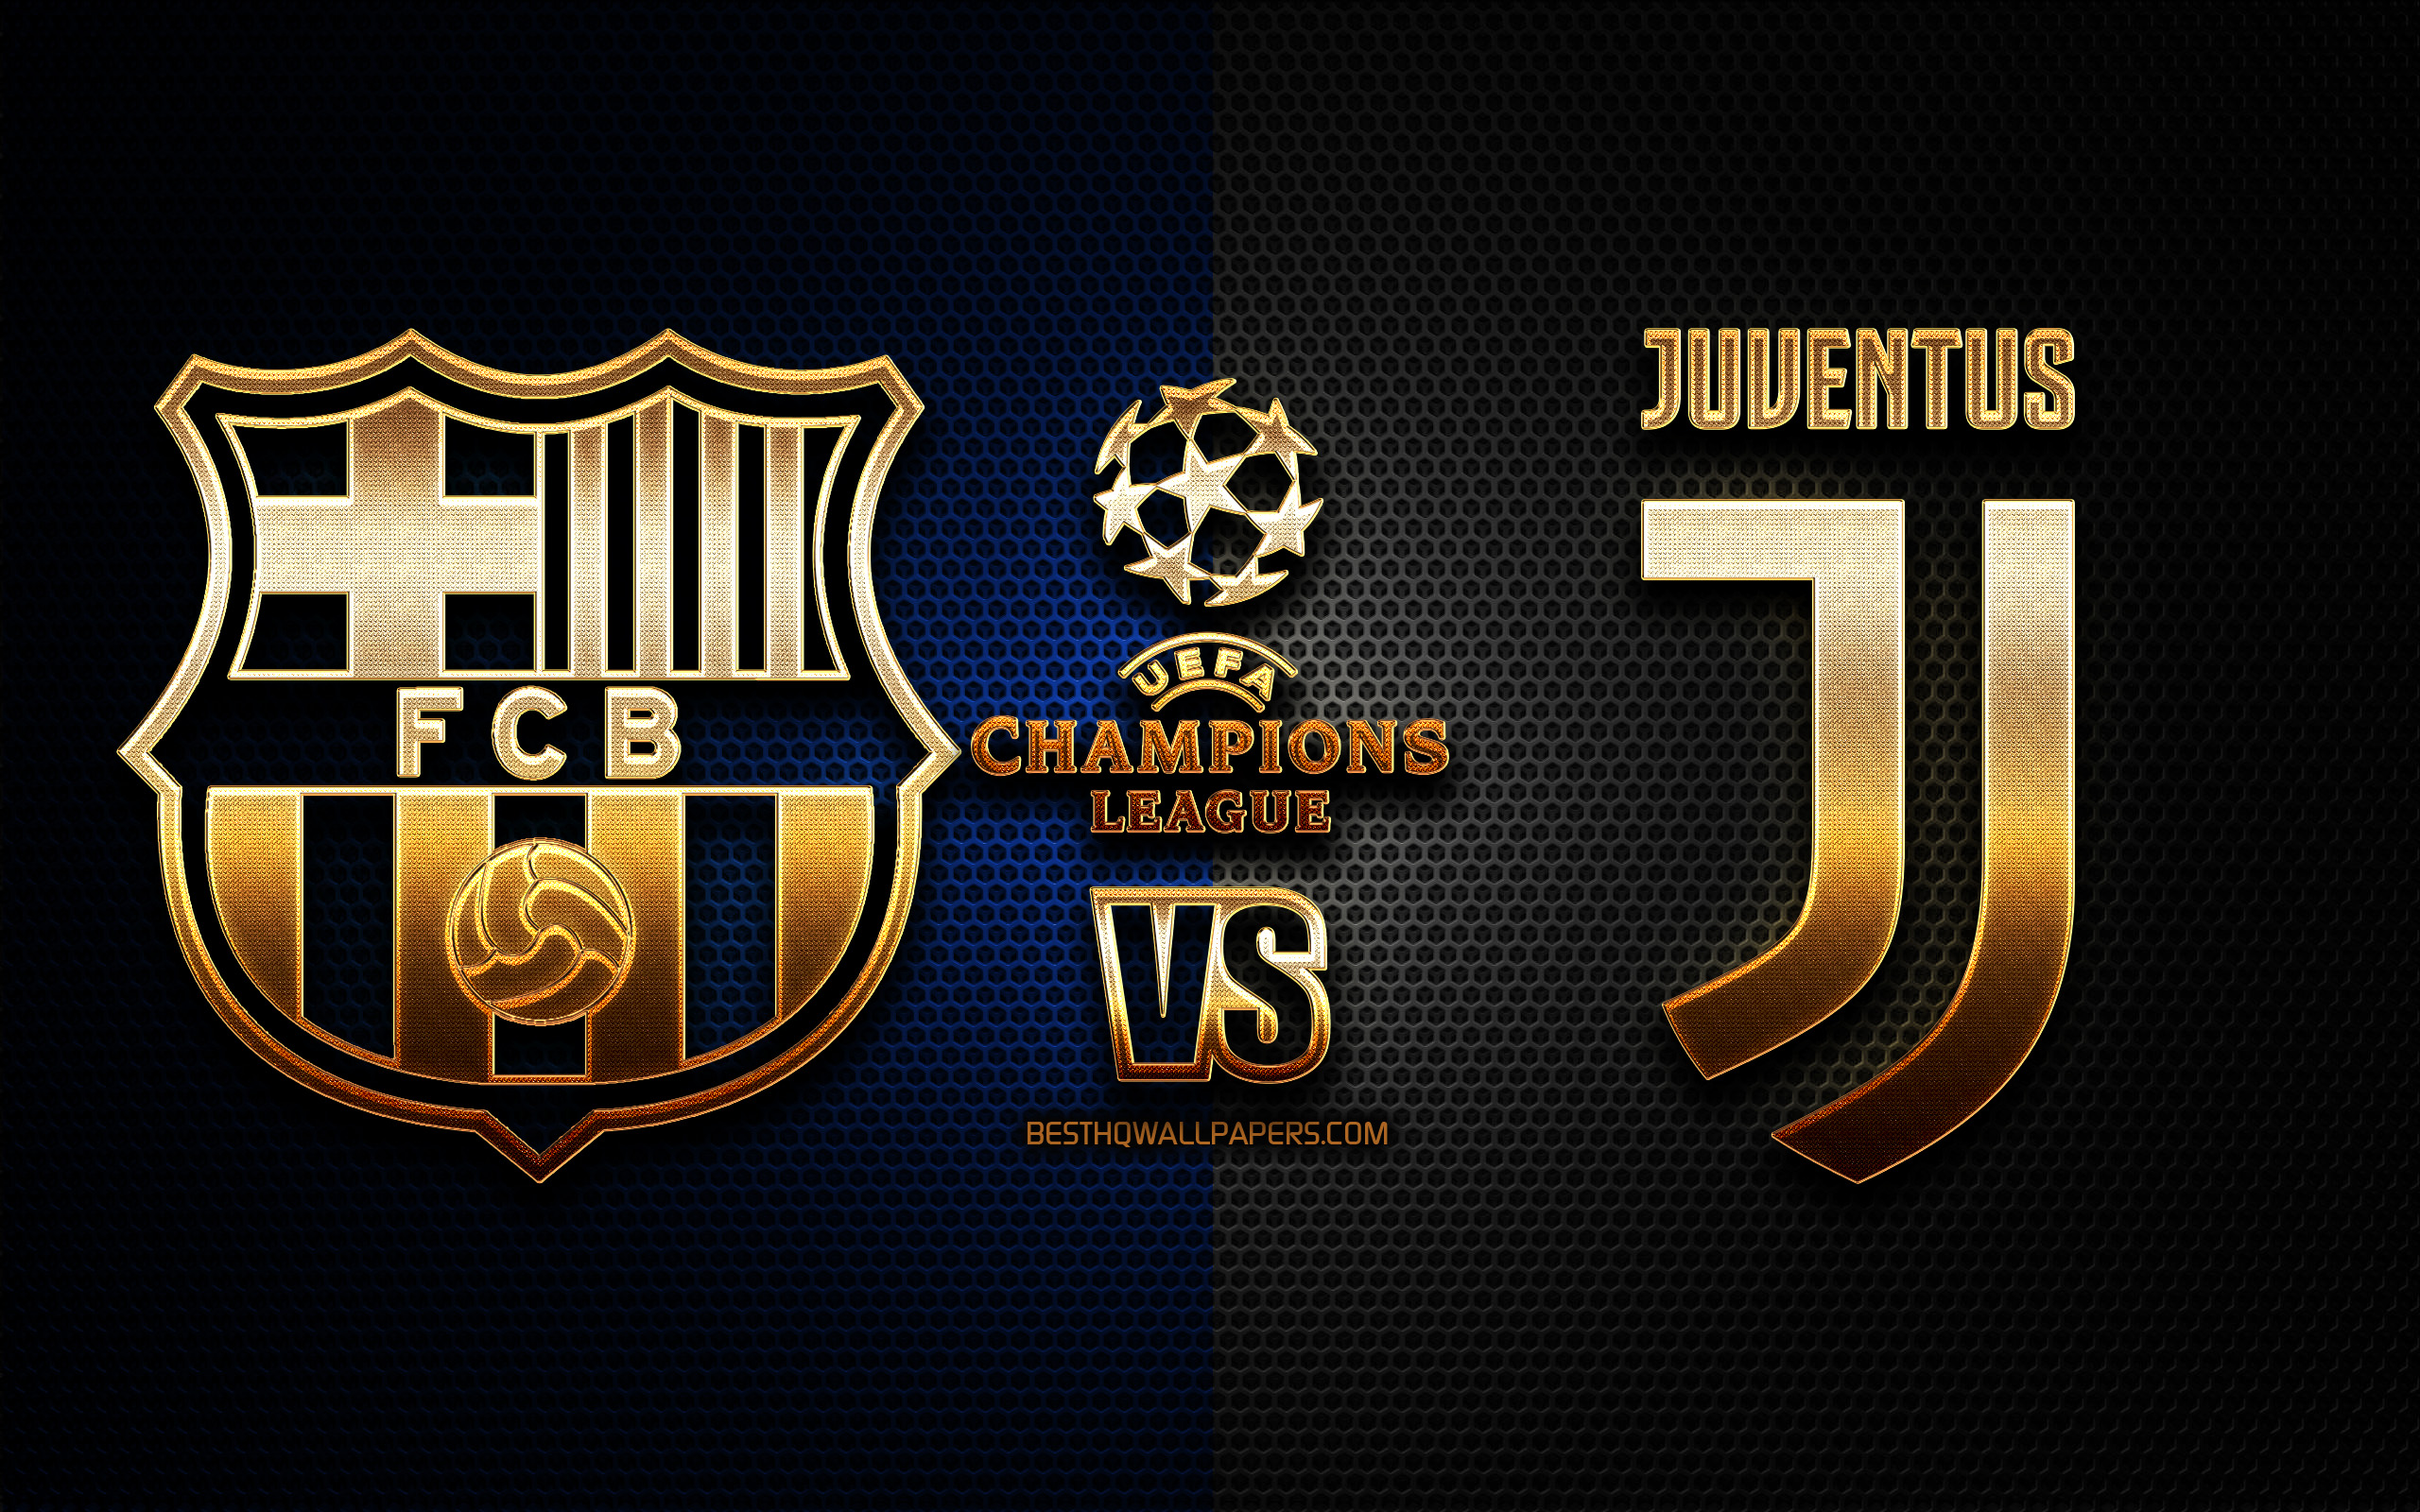 Download wallpapers Barcelona vs Juventus season 2020 2021 Group 2560x1600